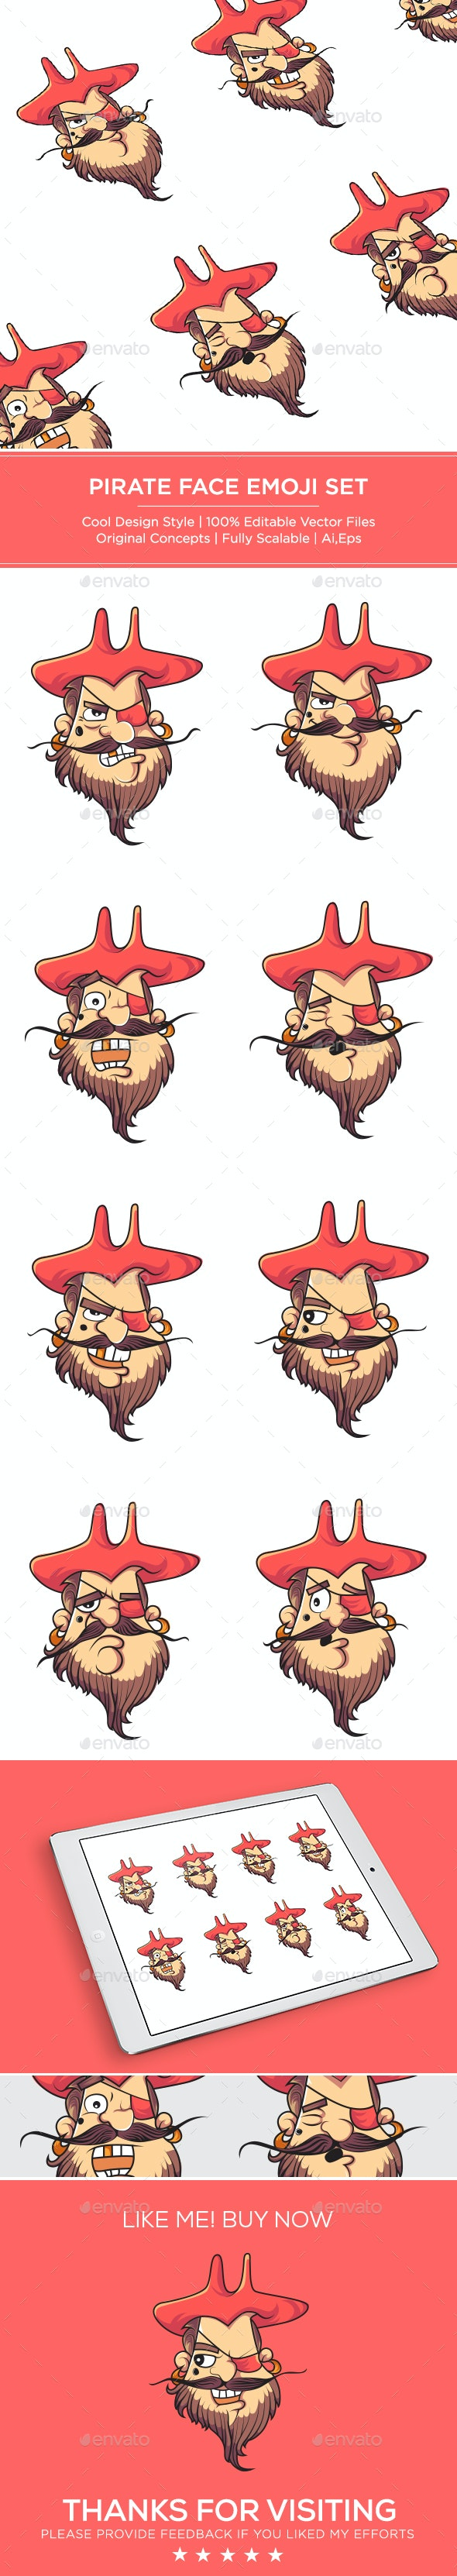 Pirate Face Emoji Set - Vectors